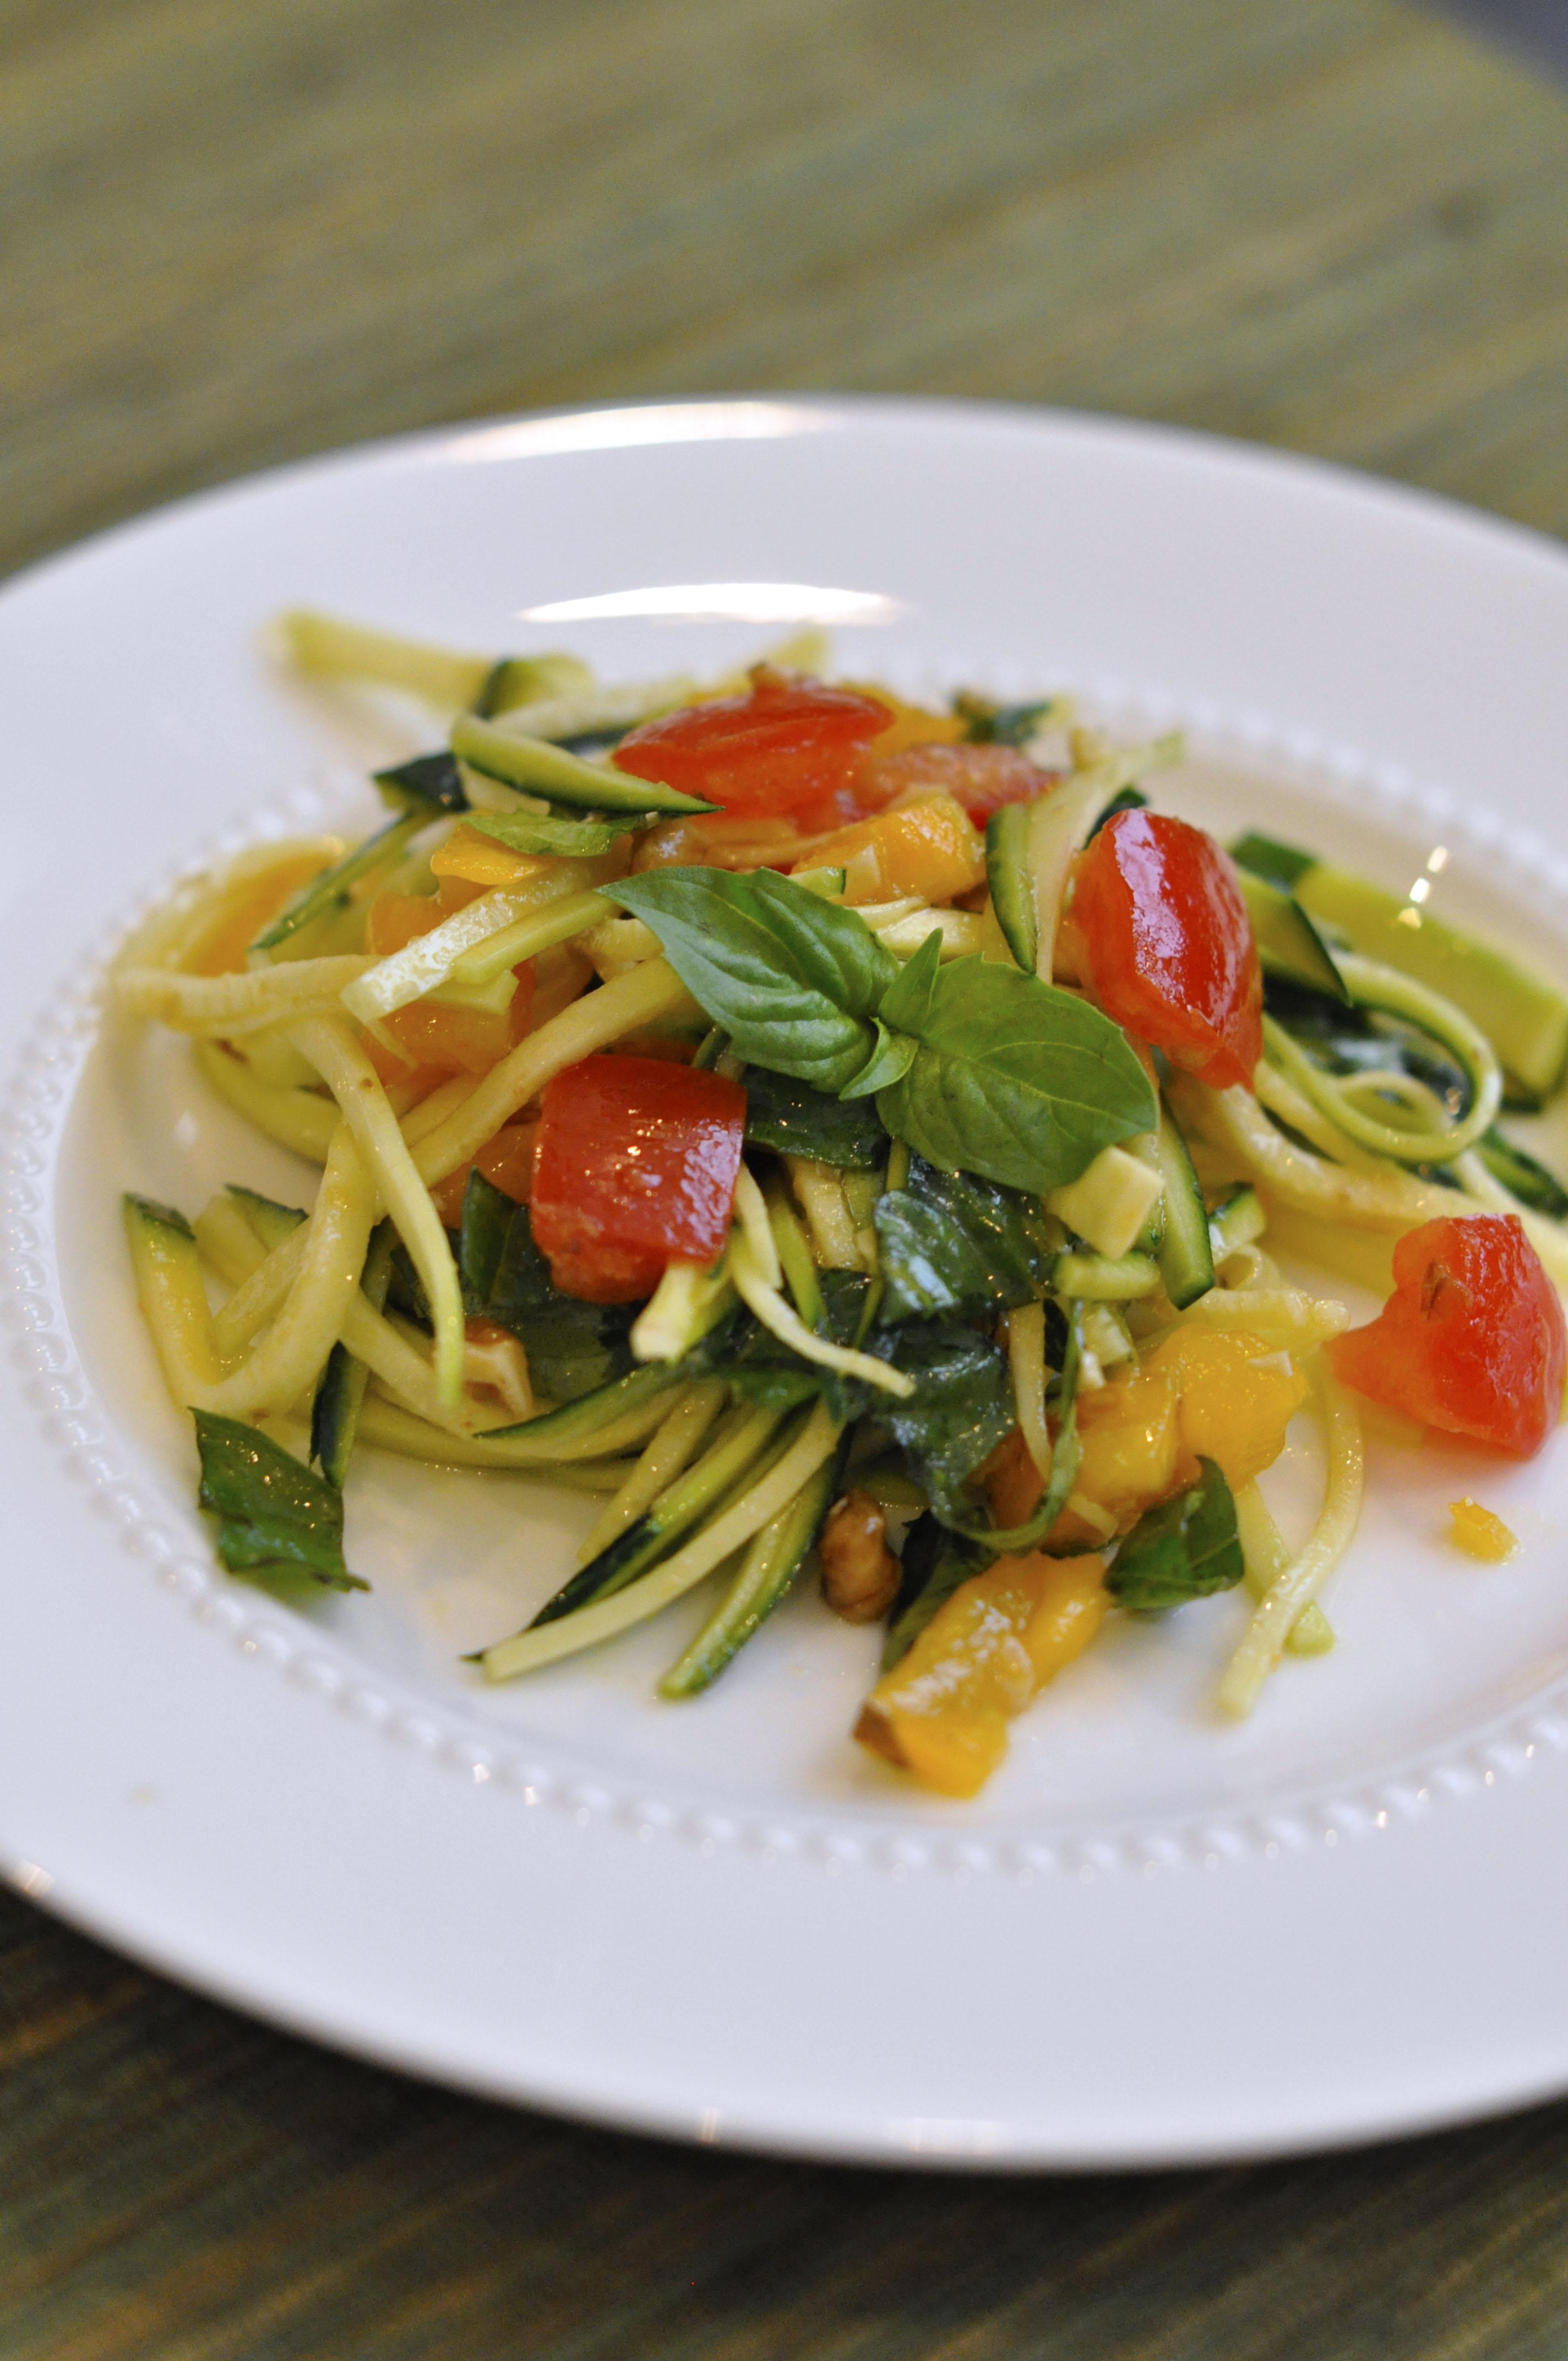 Summer Macaroni Salad With Tomatoes And Zucchini Recipe ...